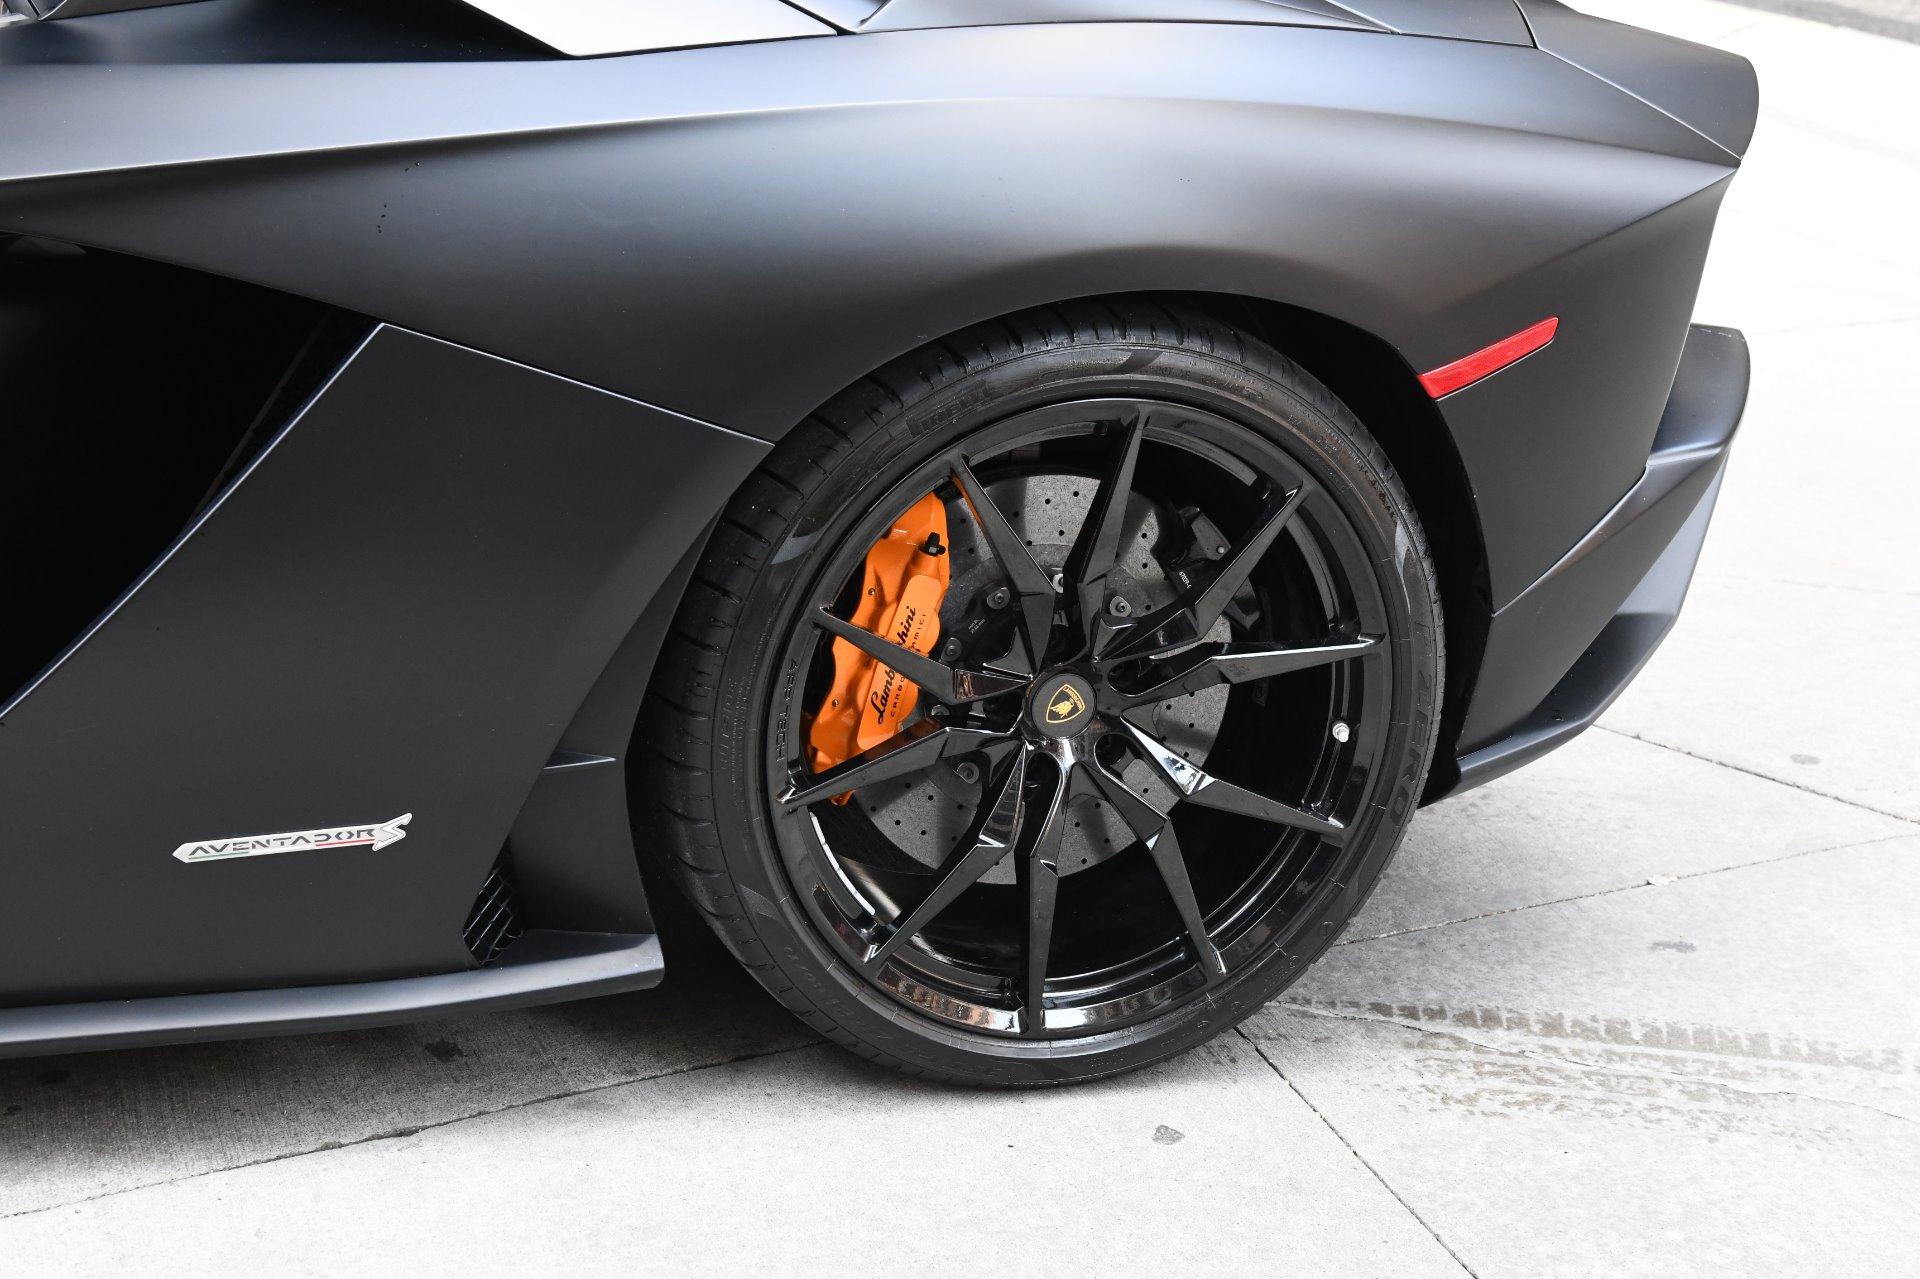 2018 lamborghini aventador black.  aventador new 2018 lamborghini aventador lp 7404 s  chicago il intended lamborghini aventador black